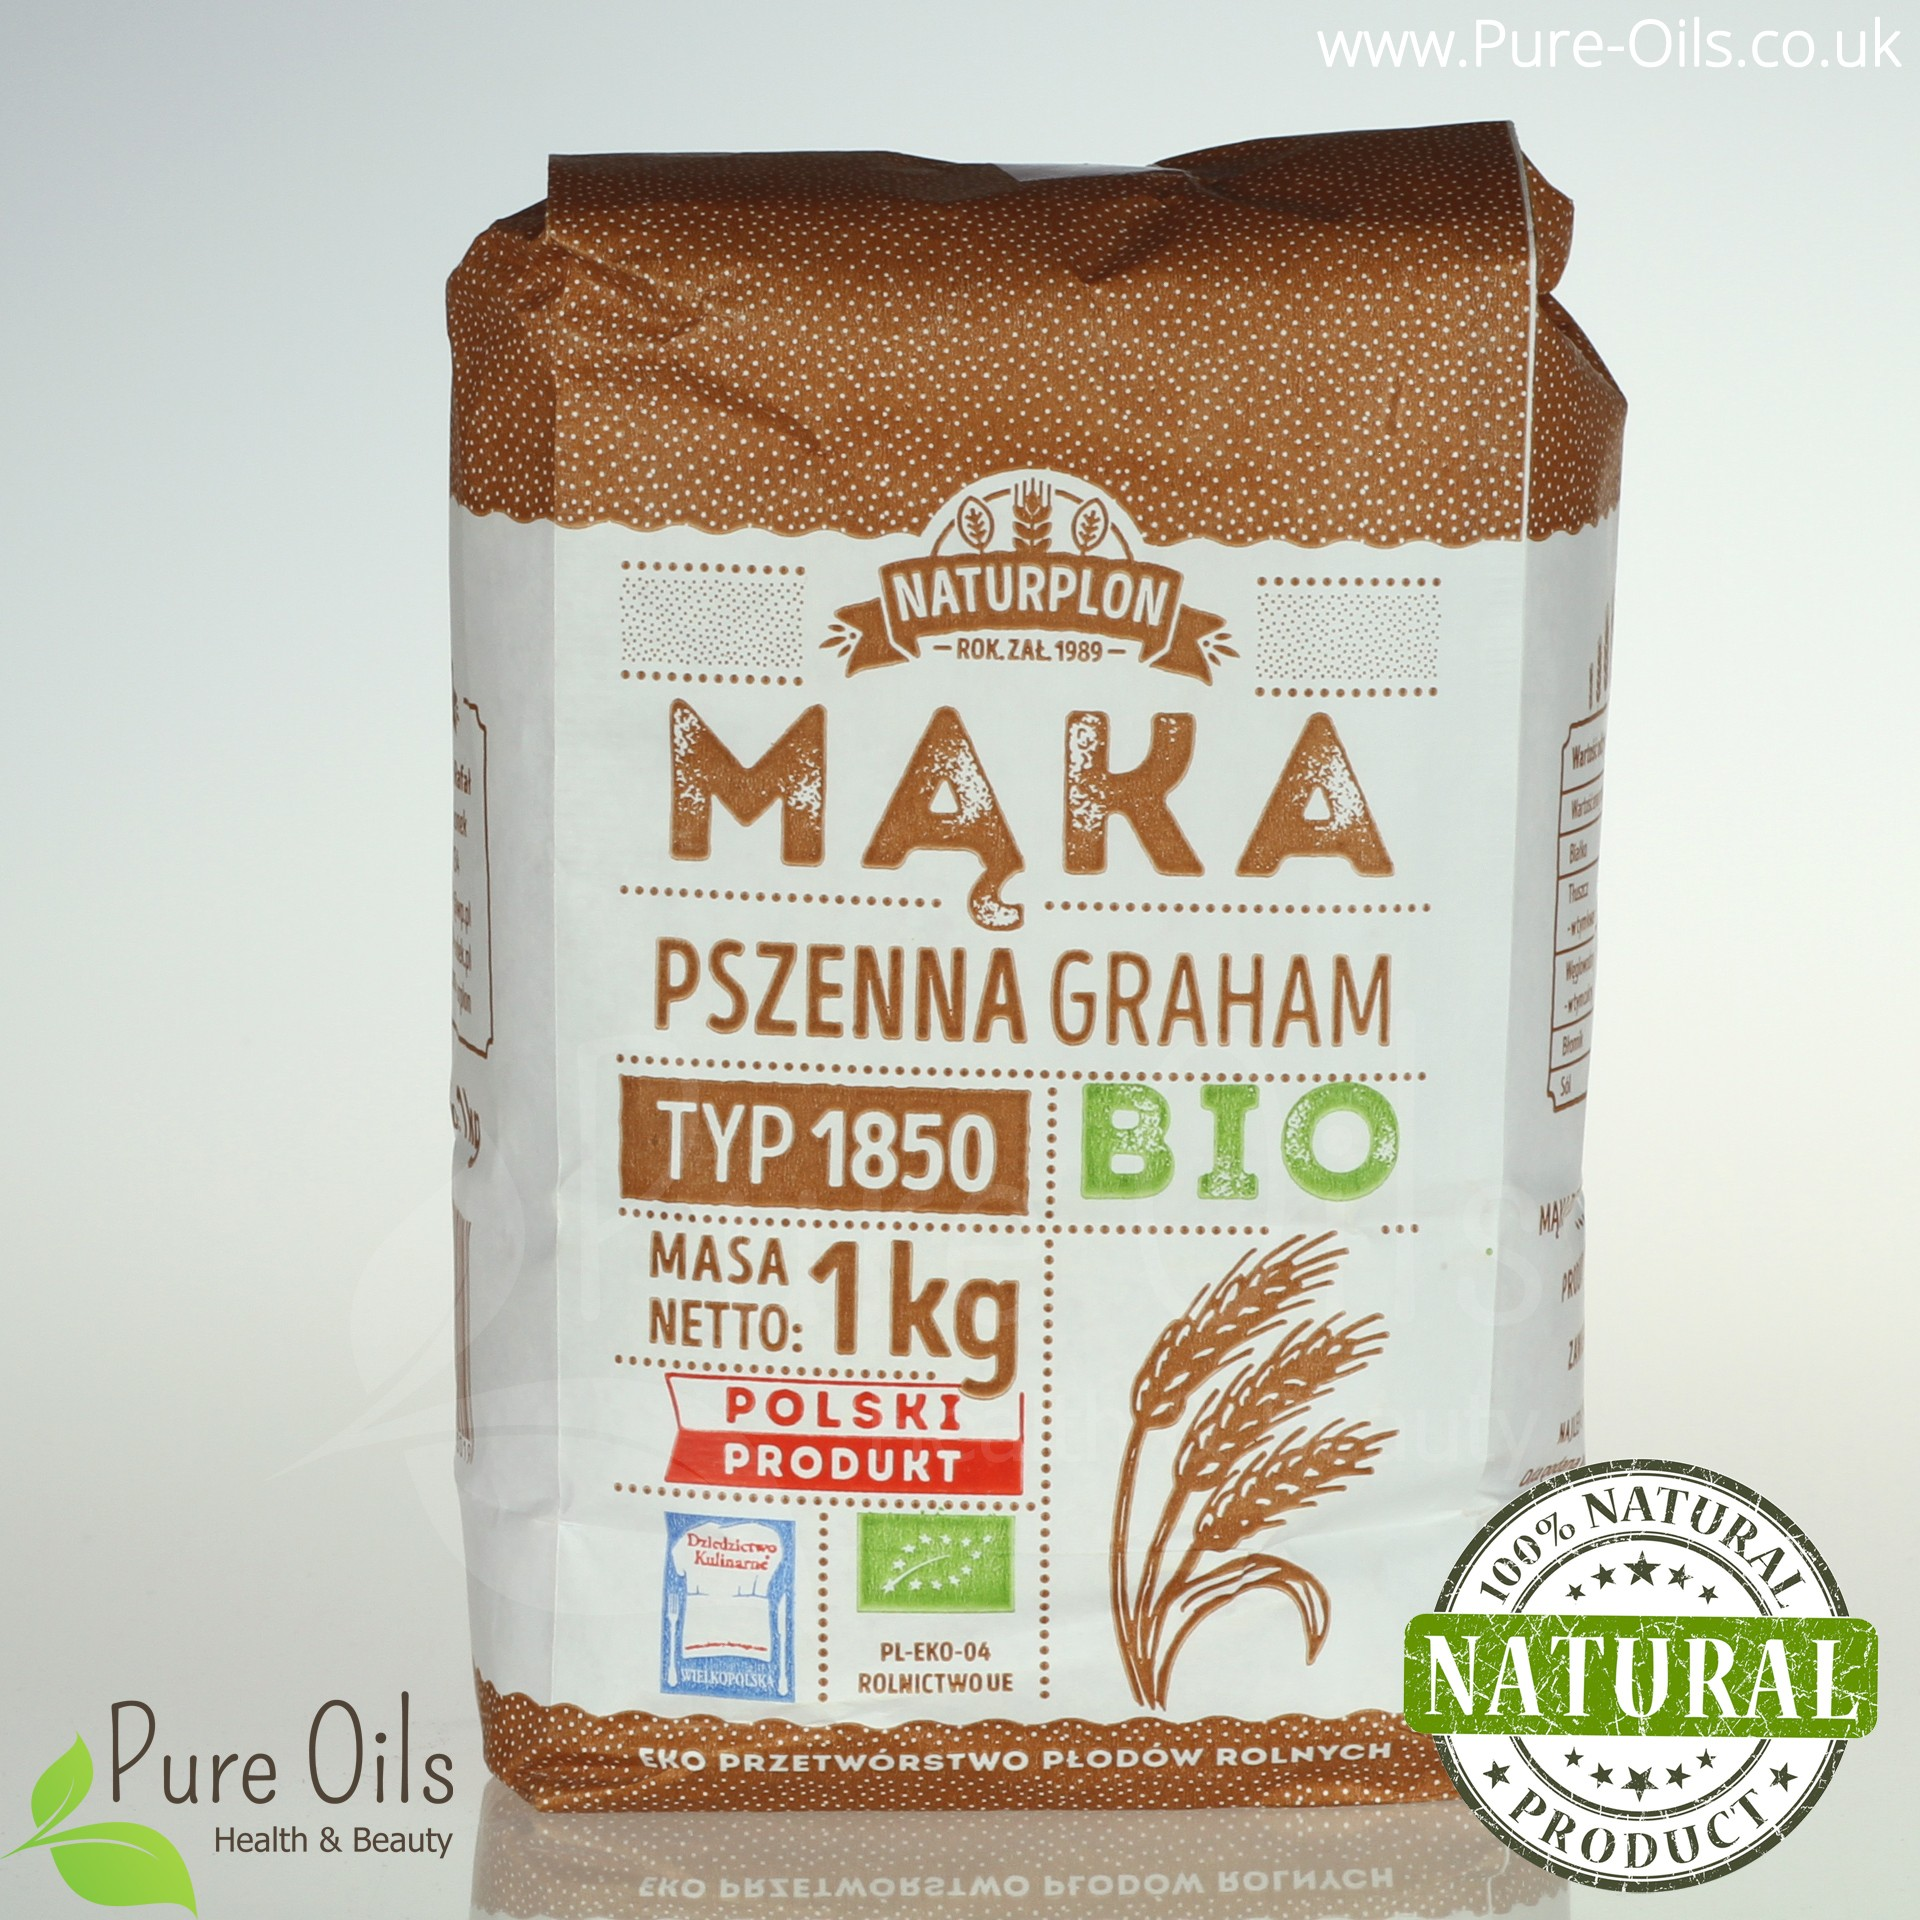 Mąka Pszenna Graham, Typ 1850 - Bio, Naturplon